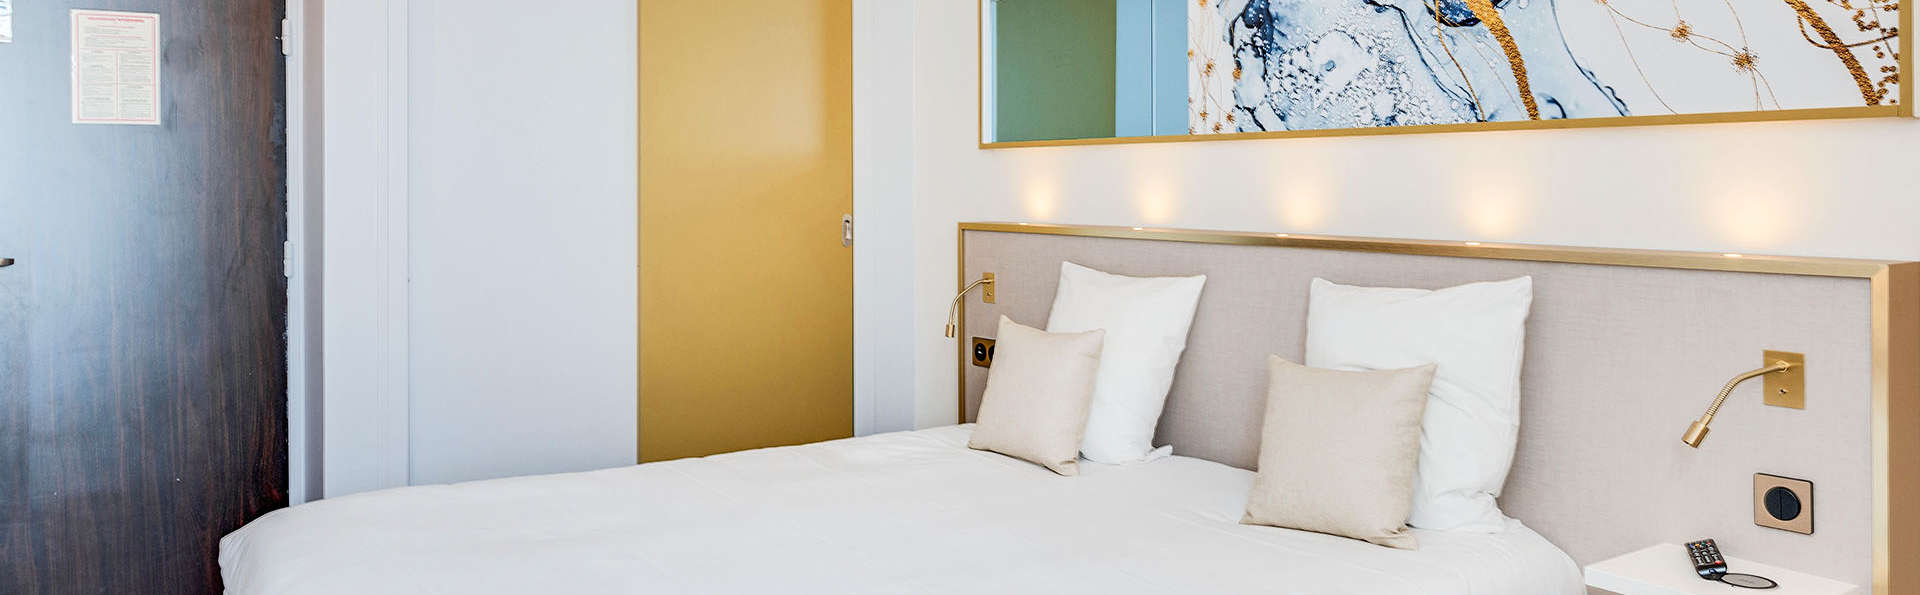 Brit Hotel Orléans St Jean de Braye - L'Antarès - EDIT_Meero-photo_03.jpg